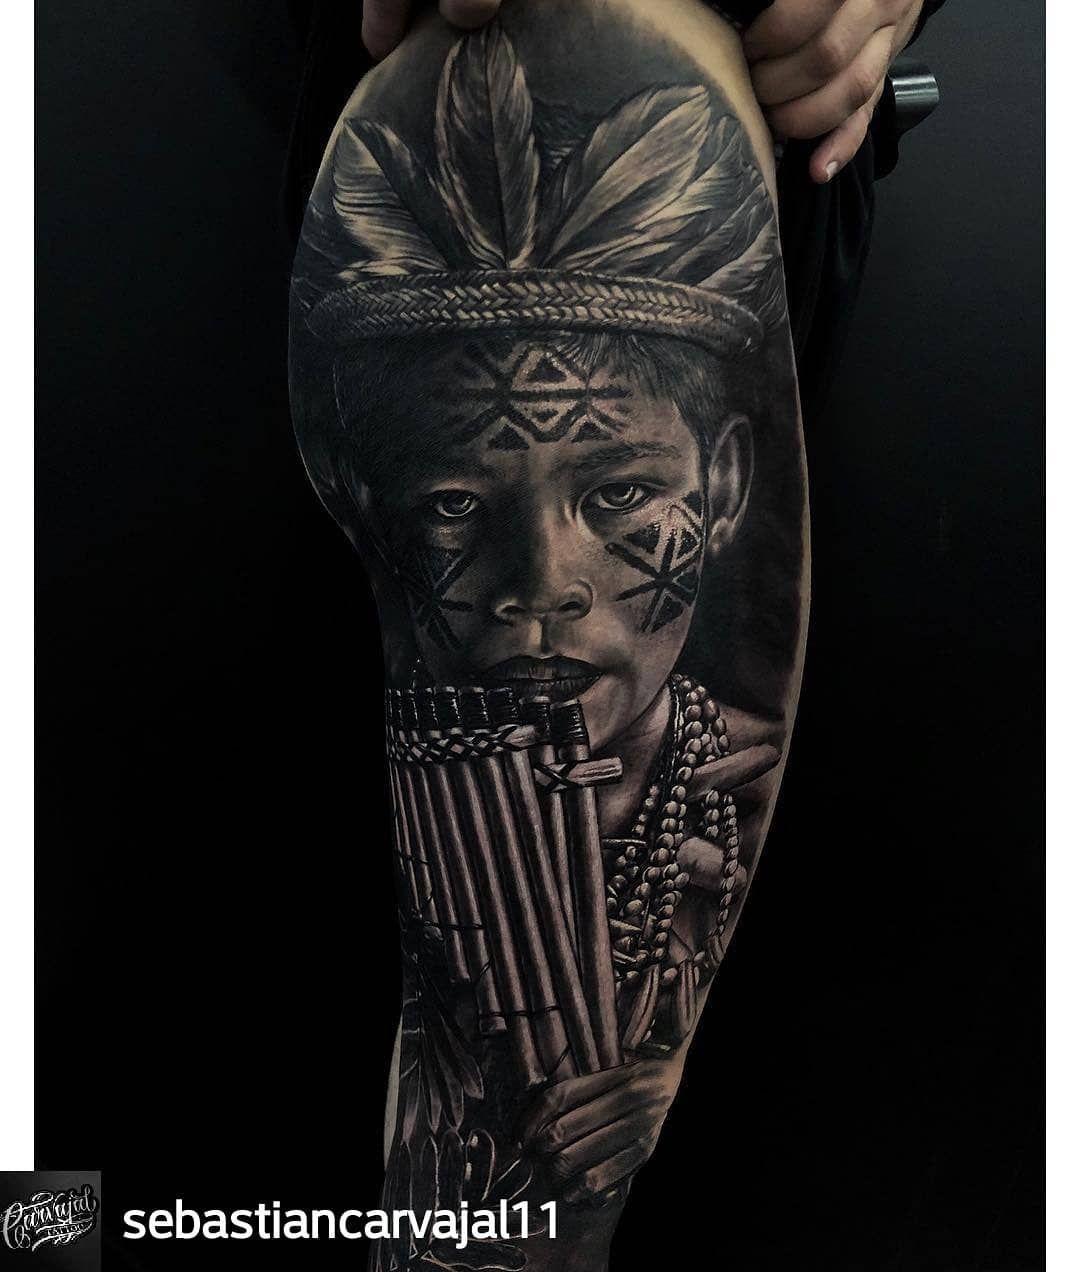 d2fa1c6cf Pin by Borislav on Tattoos   Tattoos, Amsterdam tattoo, Incredible ...